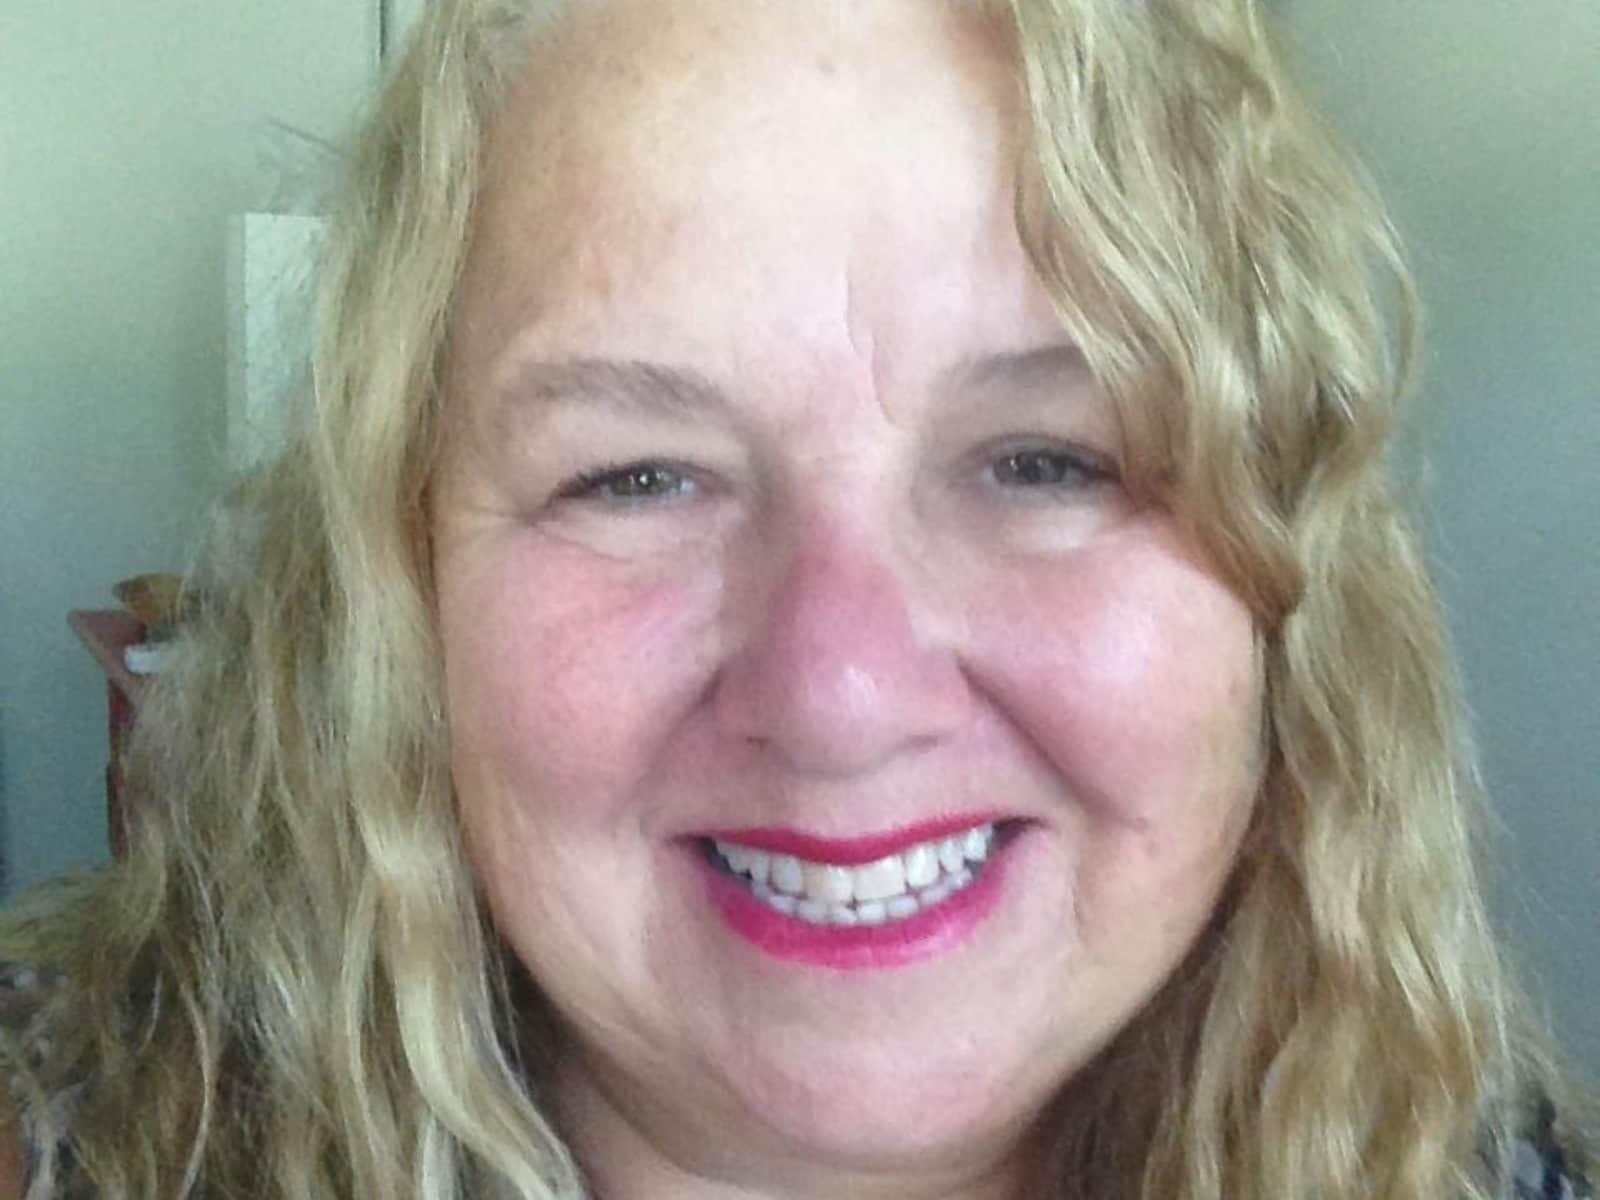 Sara lynn from St. Albert, Alberta, Canada